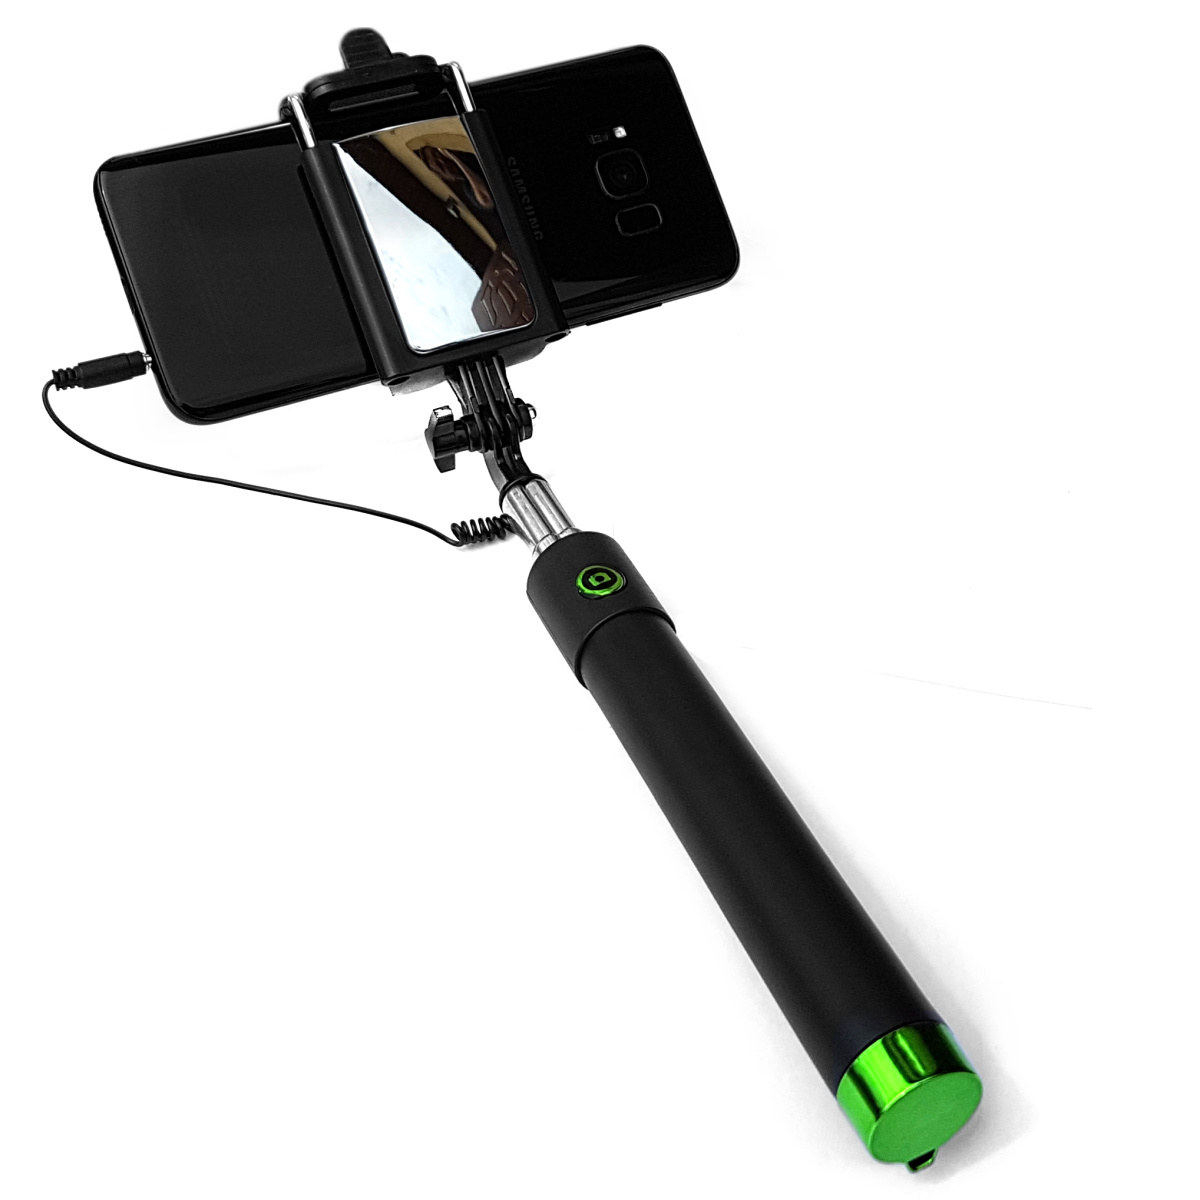 Kijek Selfiestick Monopod HTC One M8 Dual SIM